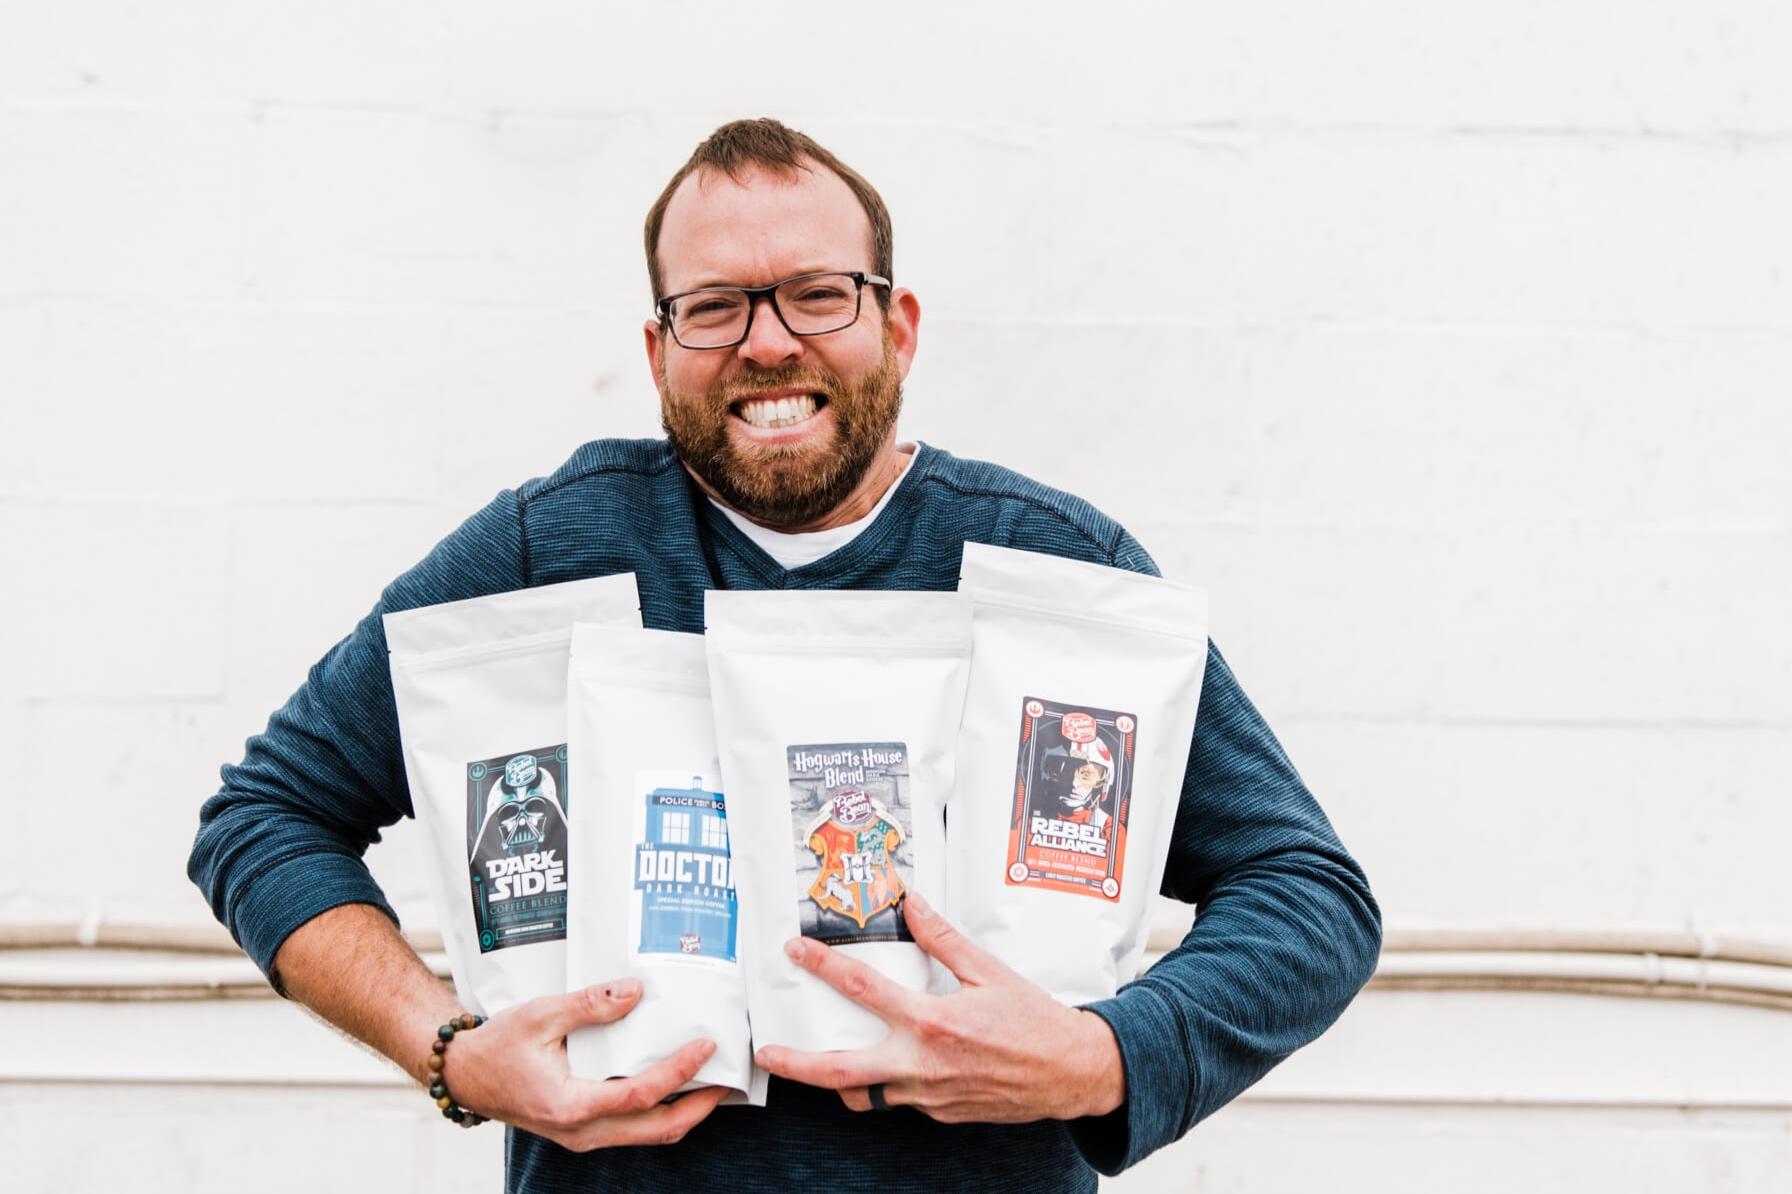 THIS IS CHRIS. - Kitchen dancer. Former K-cup brewer. Obliger. Step dad extraordinaire. Unapologetic hunter. Cries at romantic movies. Dog dad. Best smile. Unreasonably afraid of sharks. Big dork.Mr. Rebel